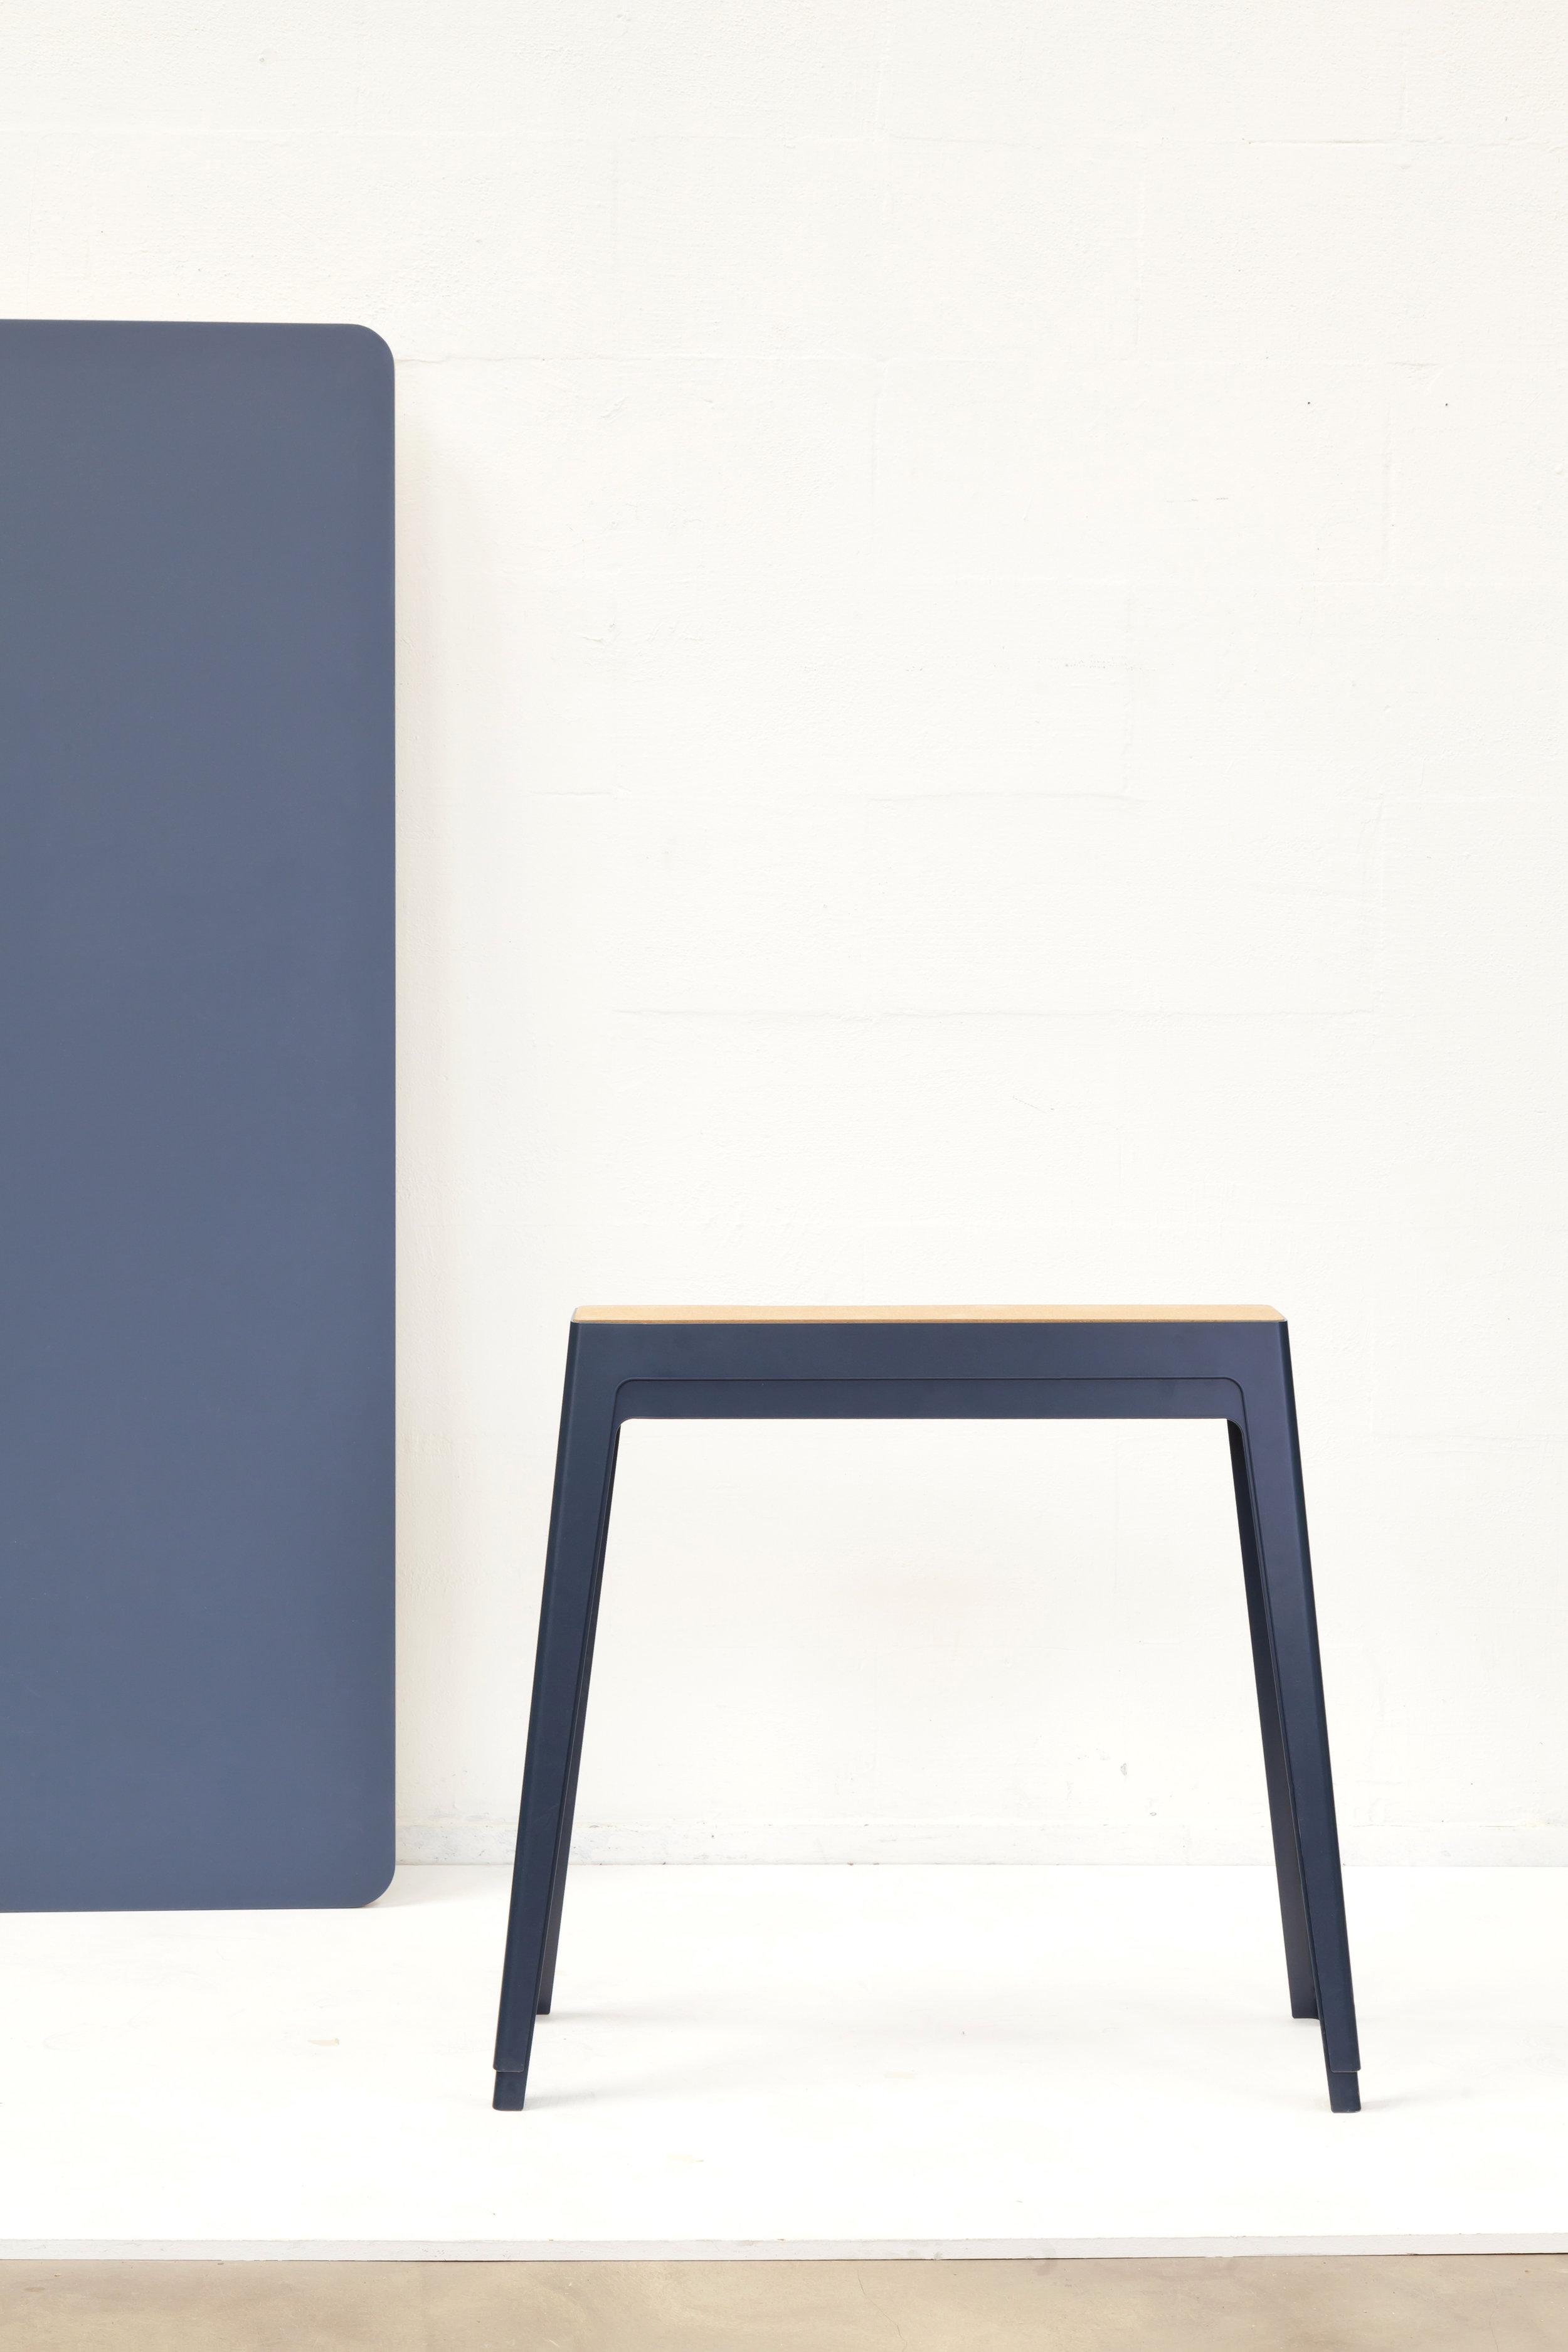 Vij5-Trestle-Table-by-David-Derksen-IMG_8413-2018-image-by-Vij5-.jpg